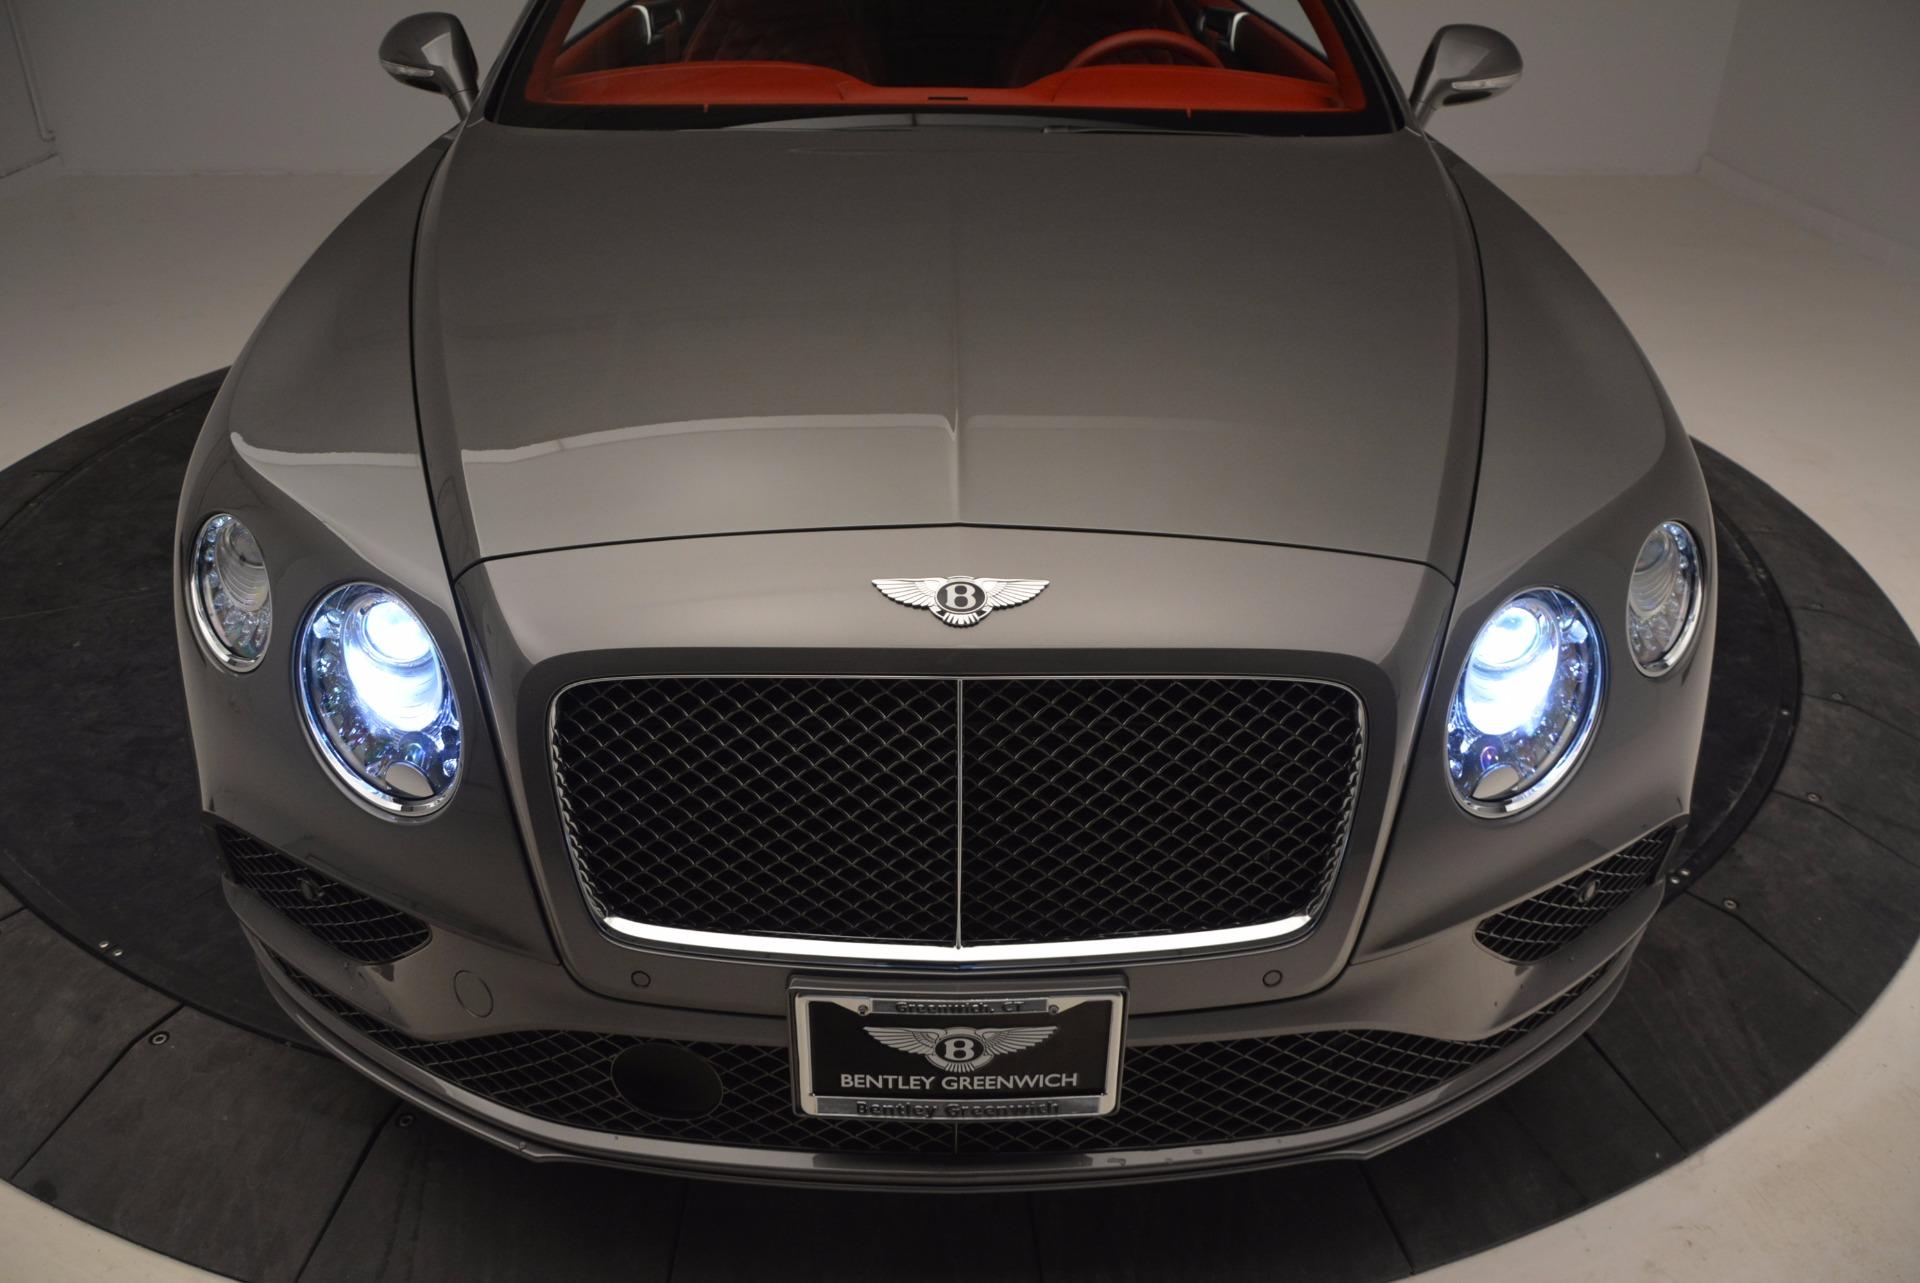 Used 2016 Bentley Continental GT Speed For Sale In Westport, CT 910_p15